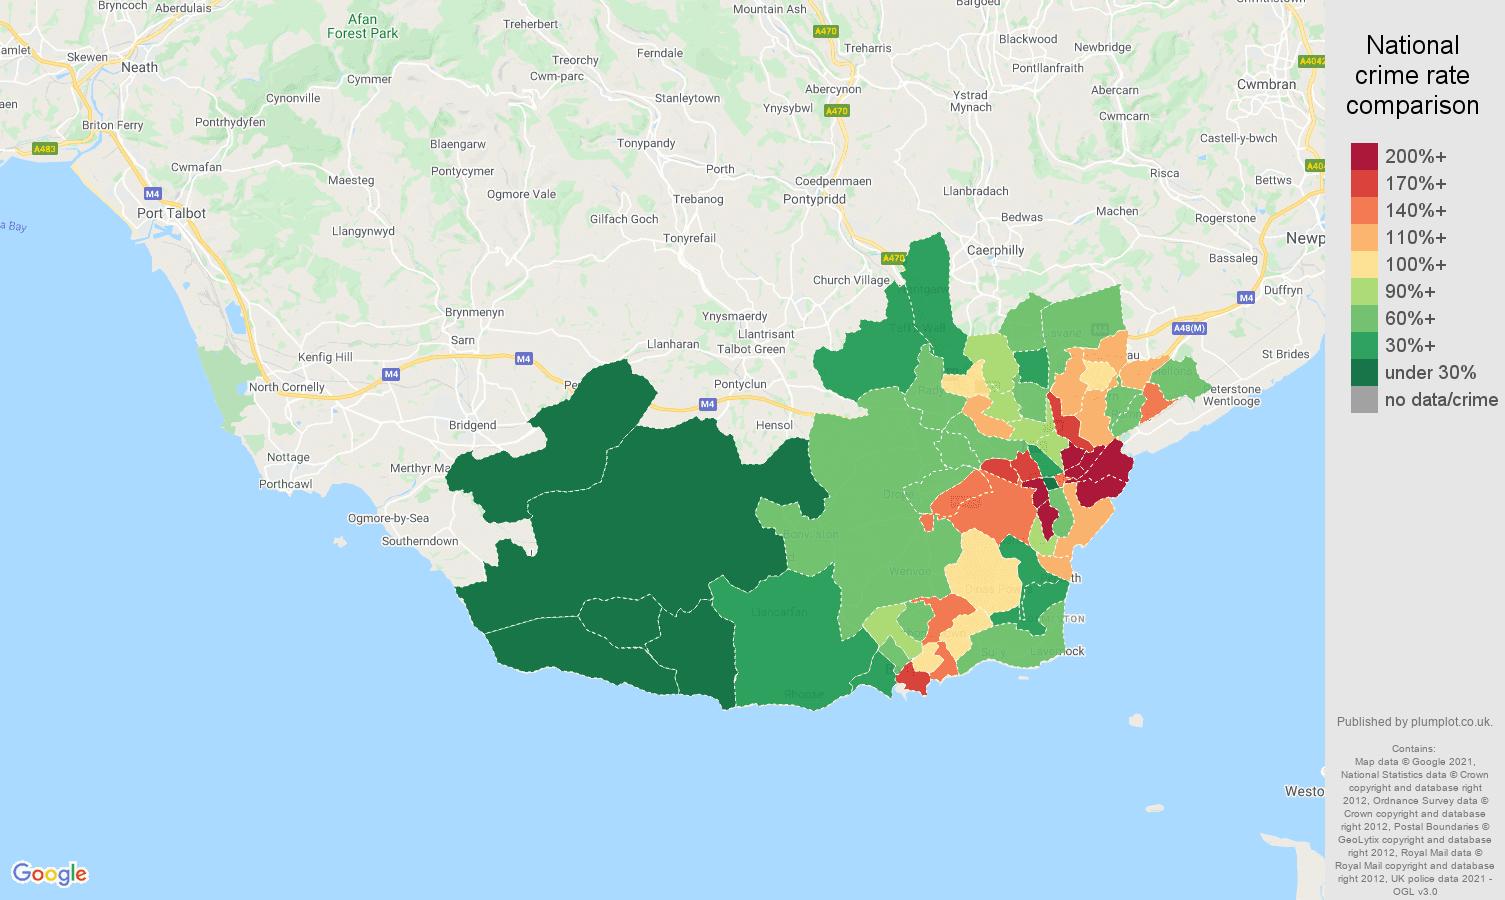 South Glamorgan vehicle crime rate comparison map